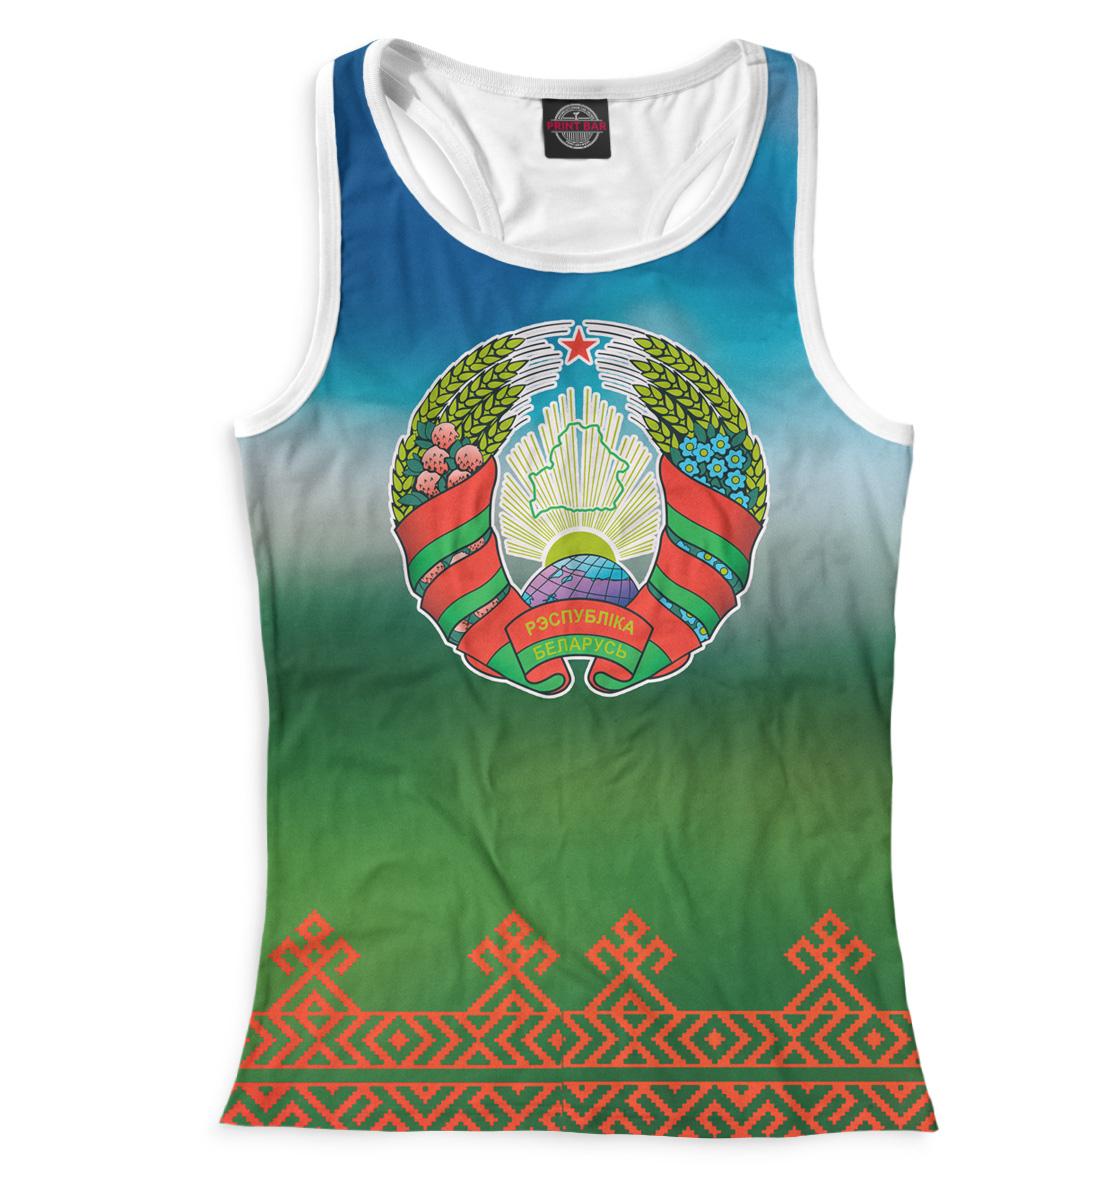 Купить Беларусь, Printbar, Майки борцовки, BLR-241400-mayb-1